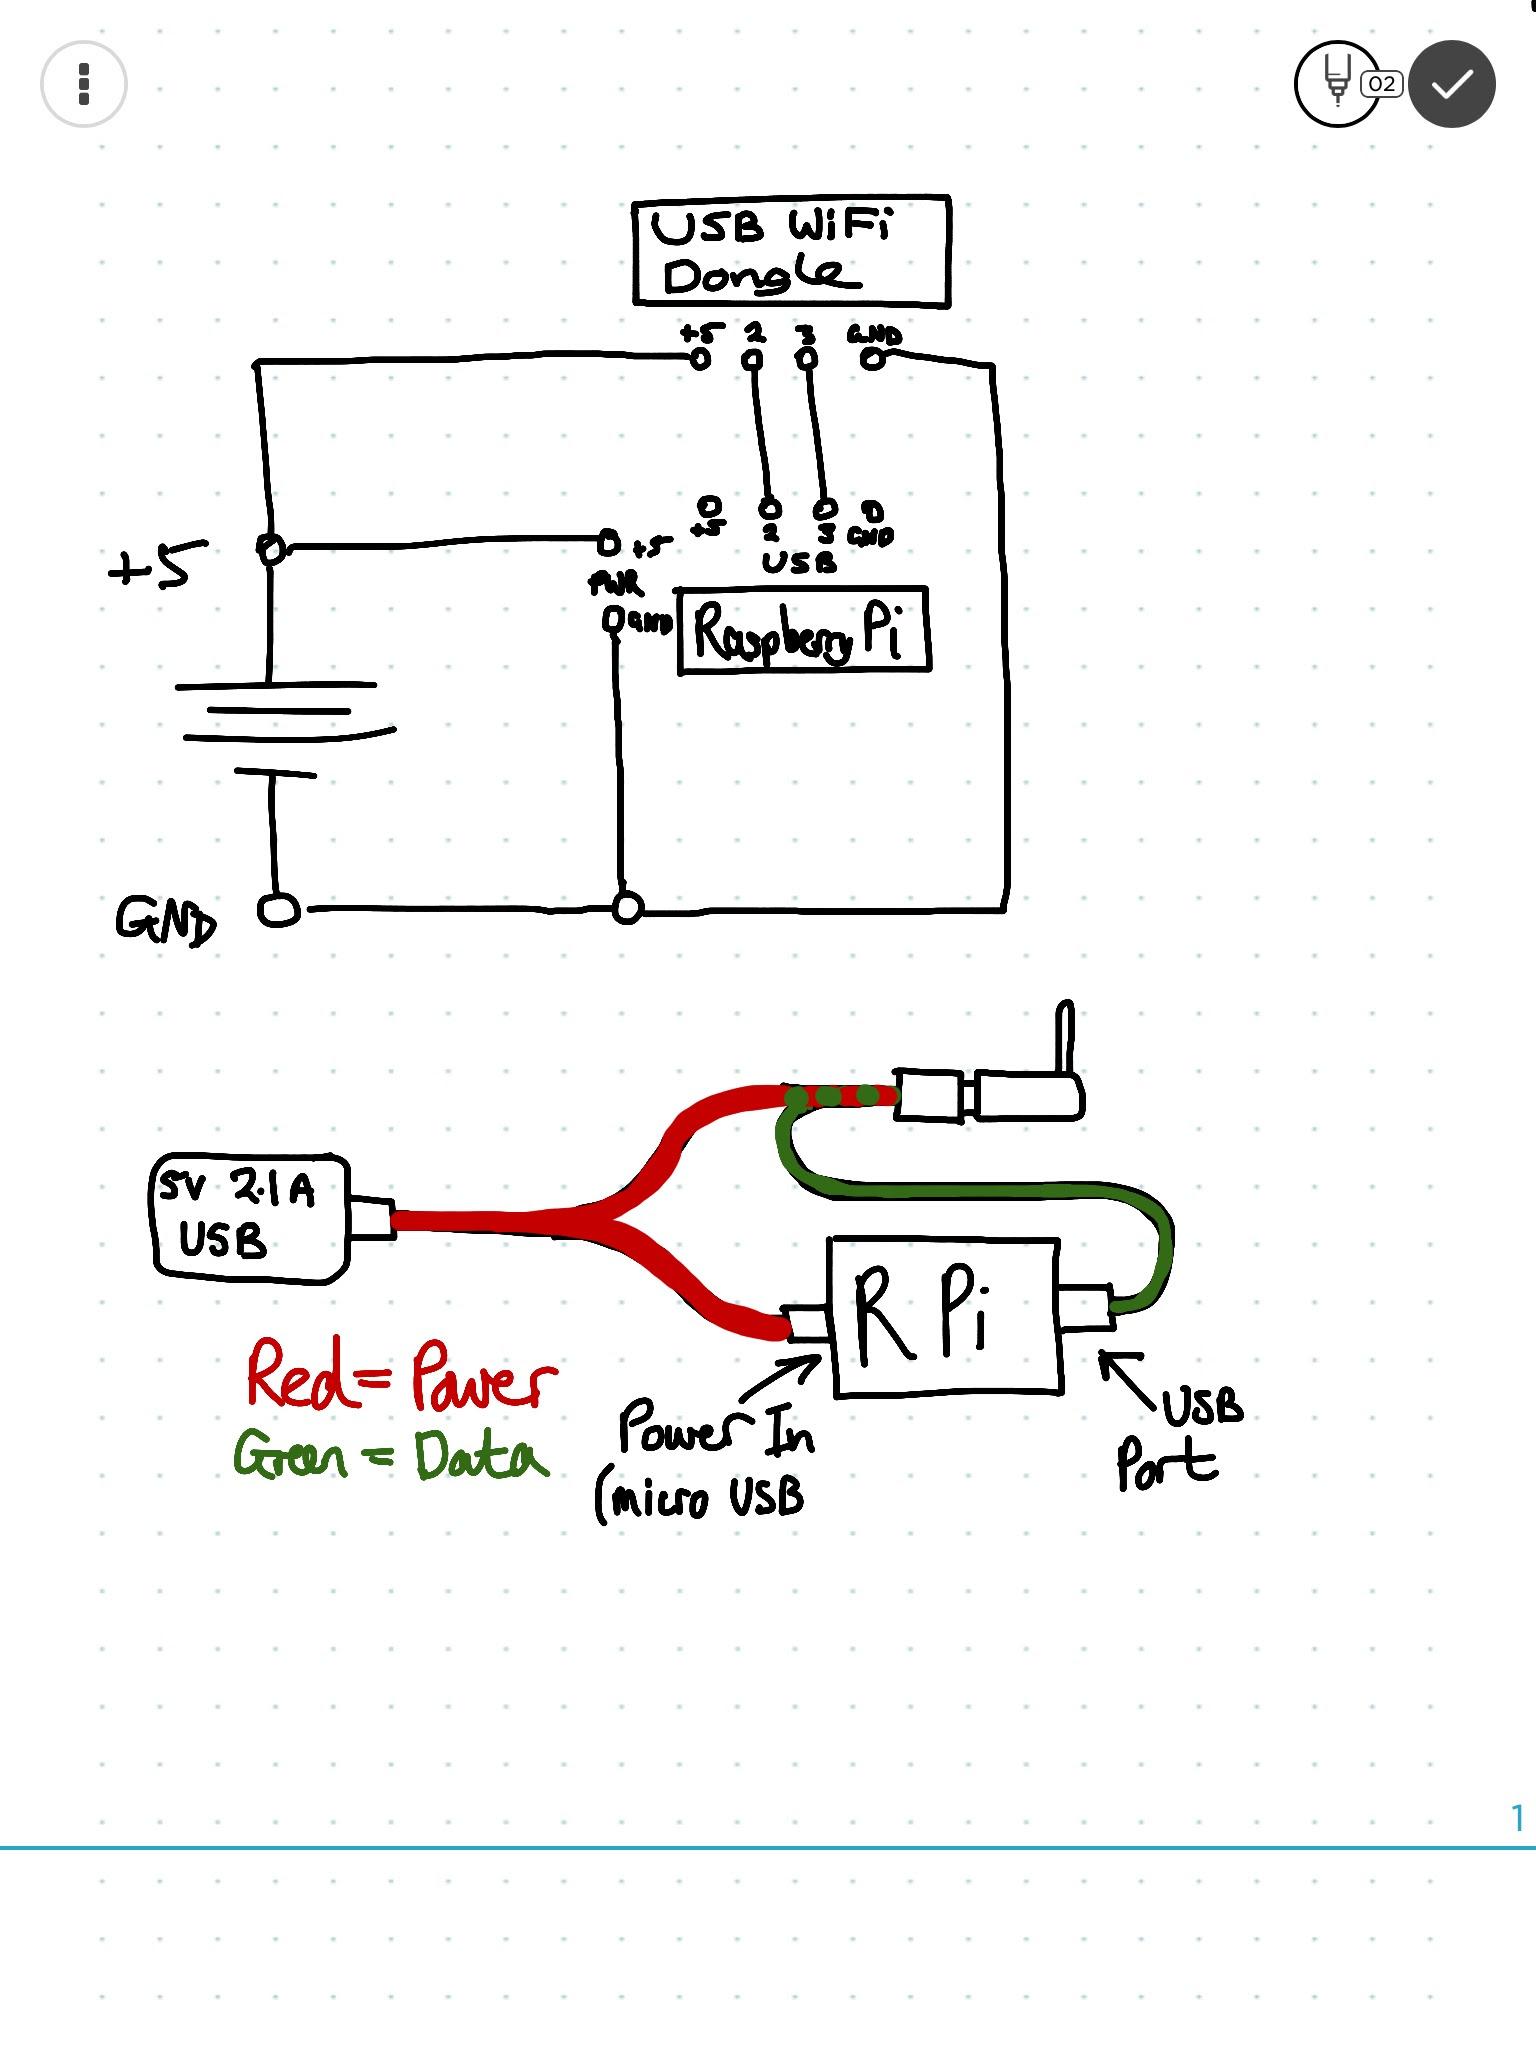 [DIAGRAM_38EU]  DIAGRAM] Fisher Plow Joy Stick Wire Diagram FULL Version HD Quality Wire  Diagram - MEDIAGRAME.CASAMANUELLI.IT   Western Plow Joystick Wiring Diagram      mediagrame.casamanuelli.it